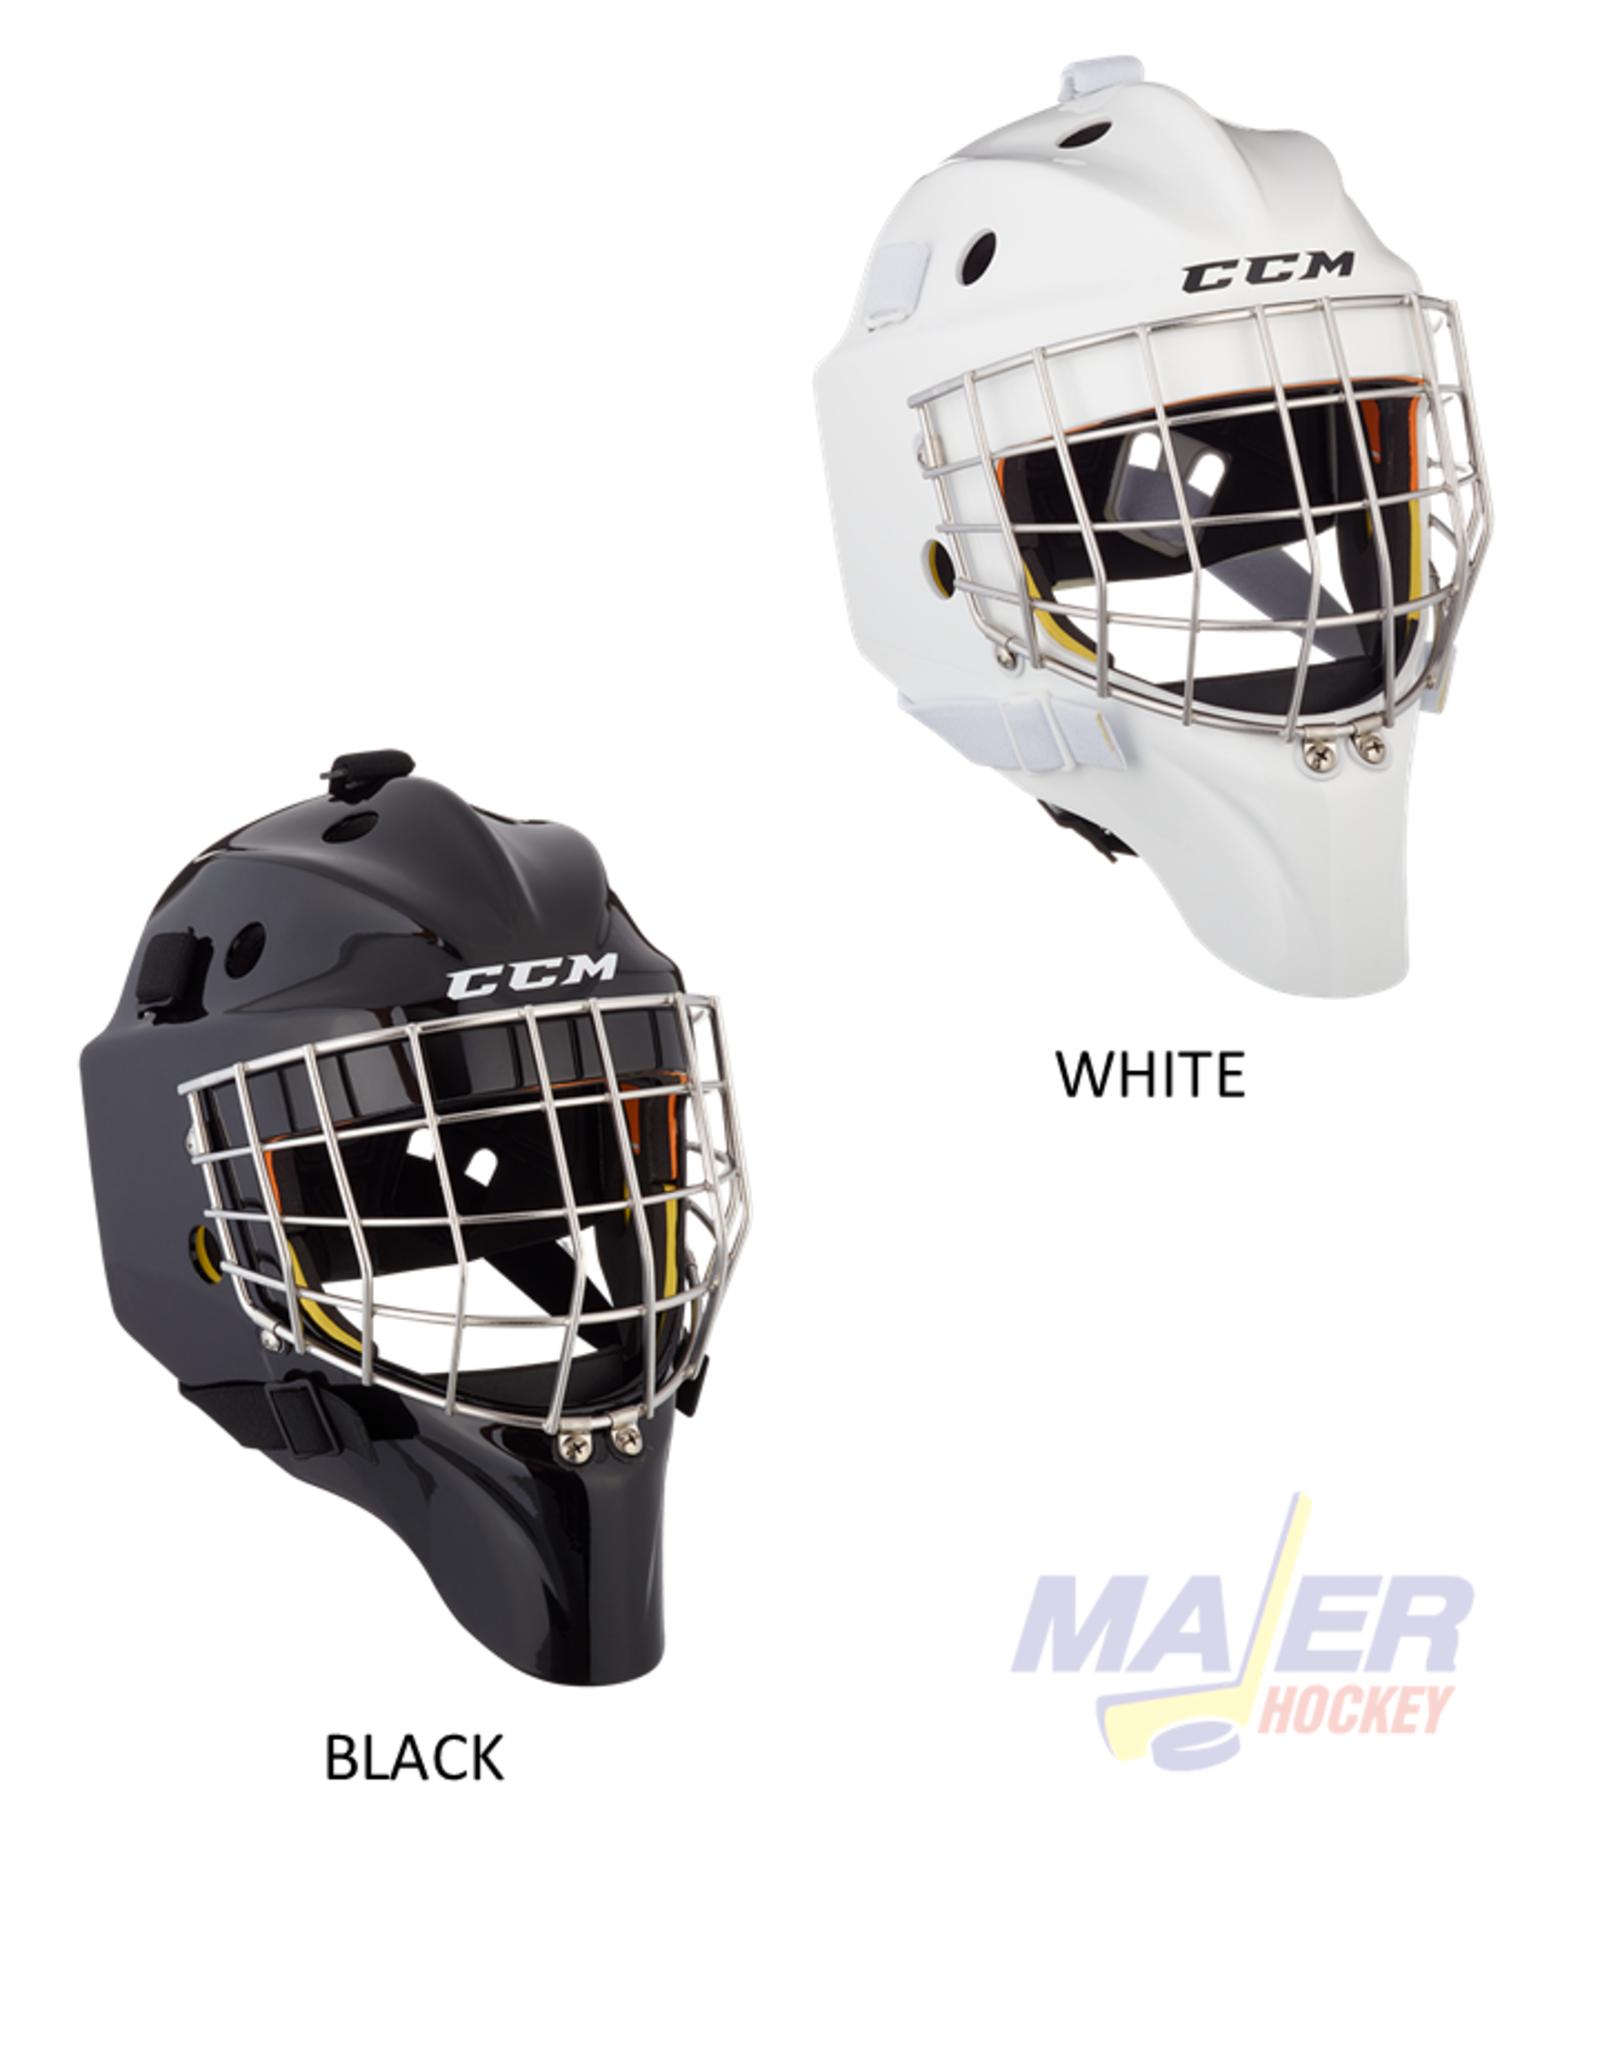 CCM Axis 1.9 Senior Goalie Mask